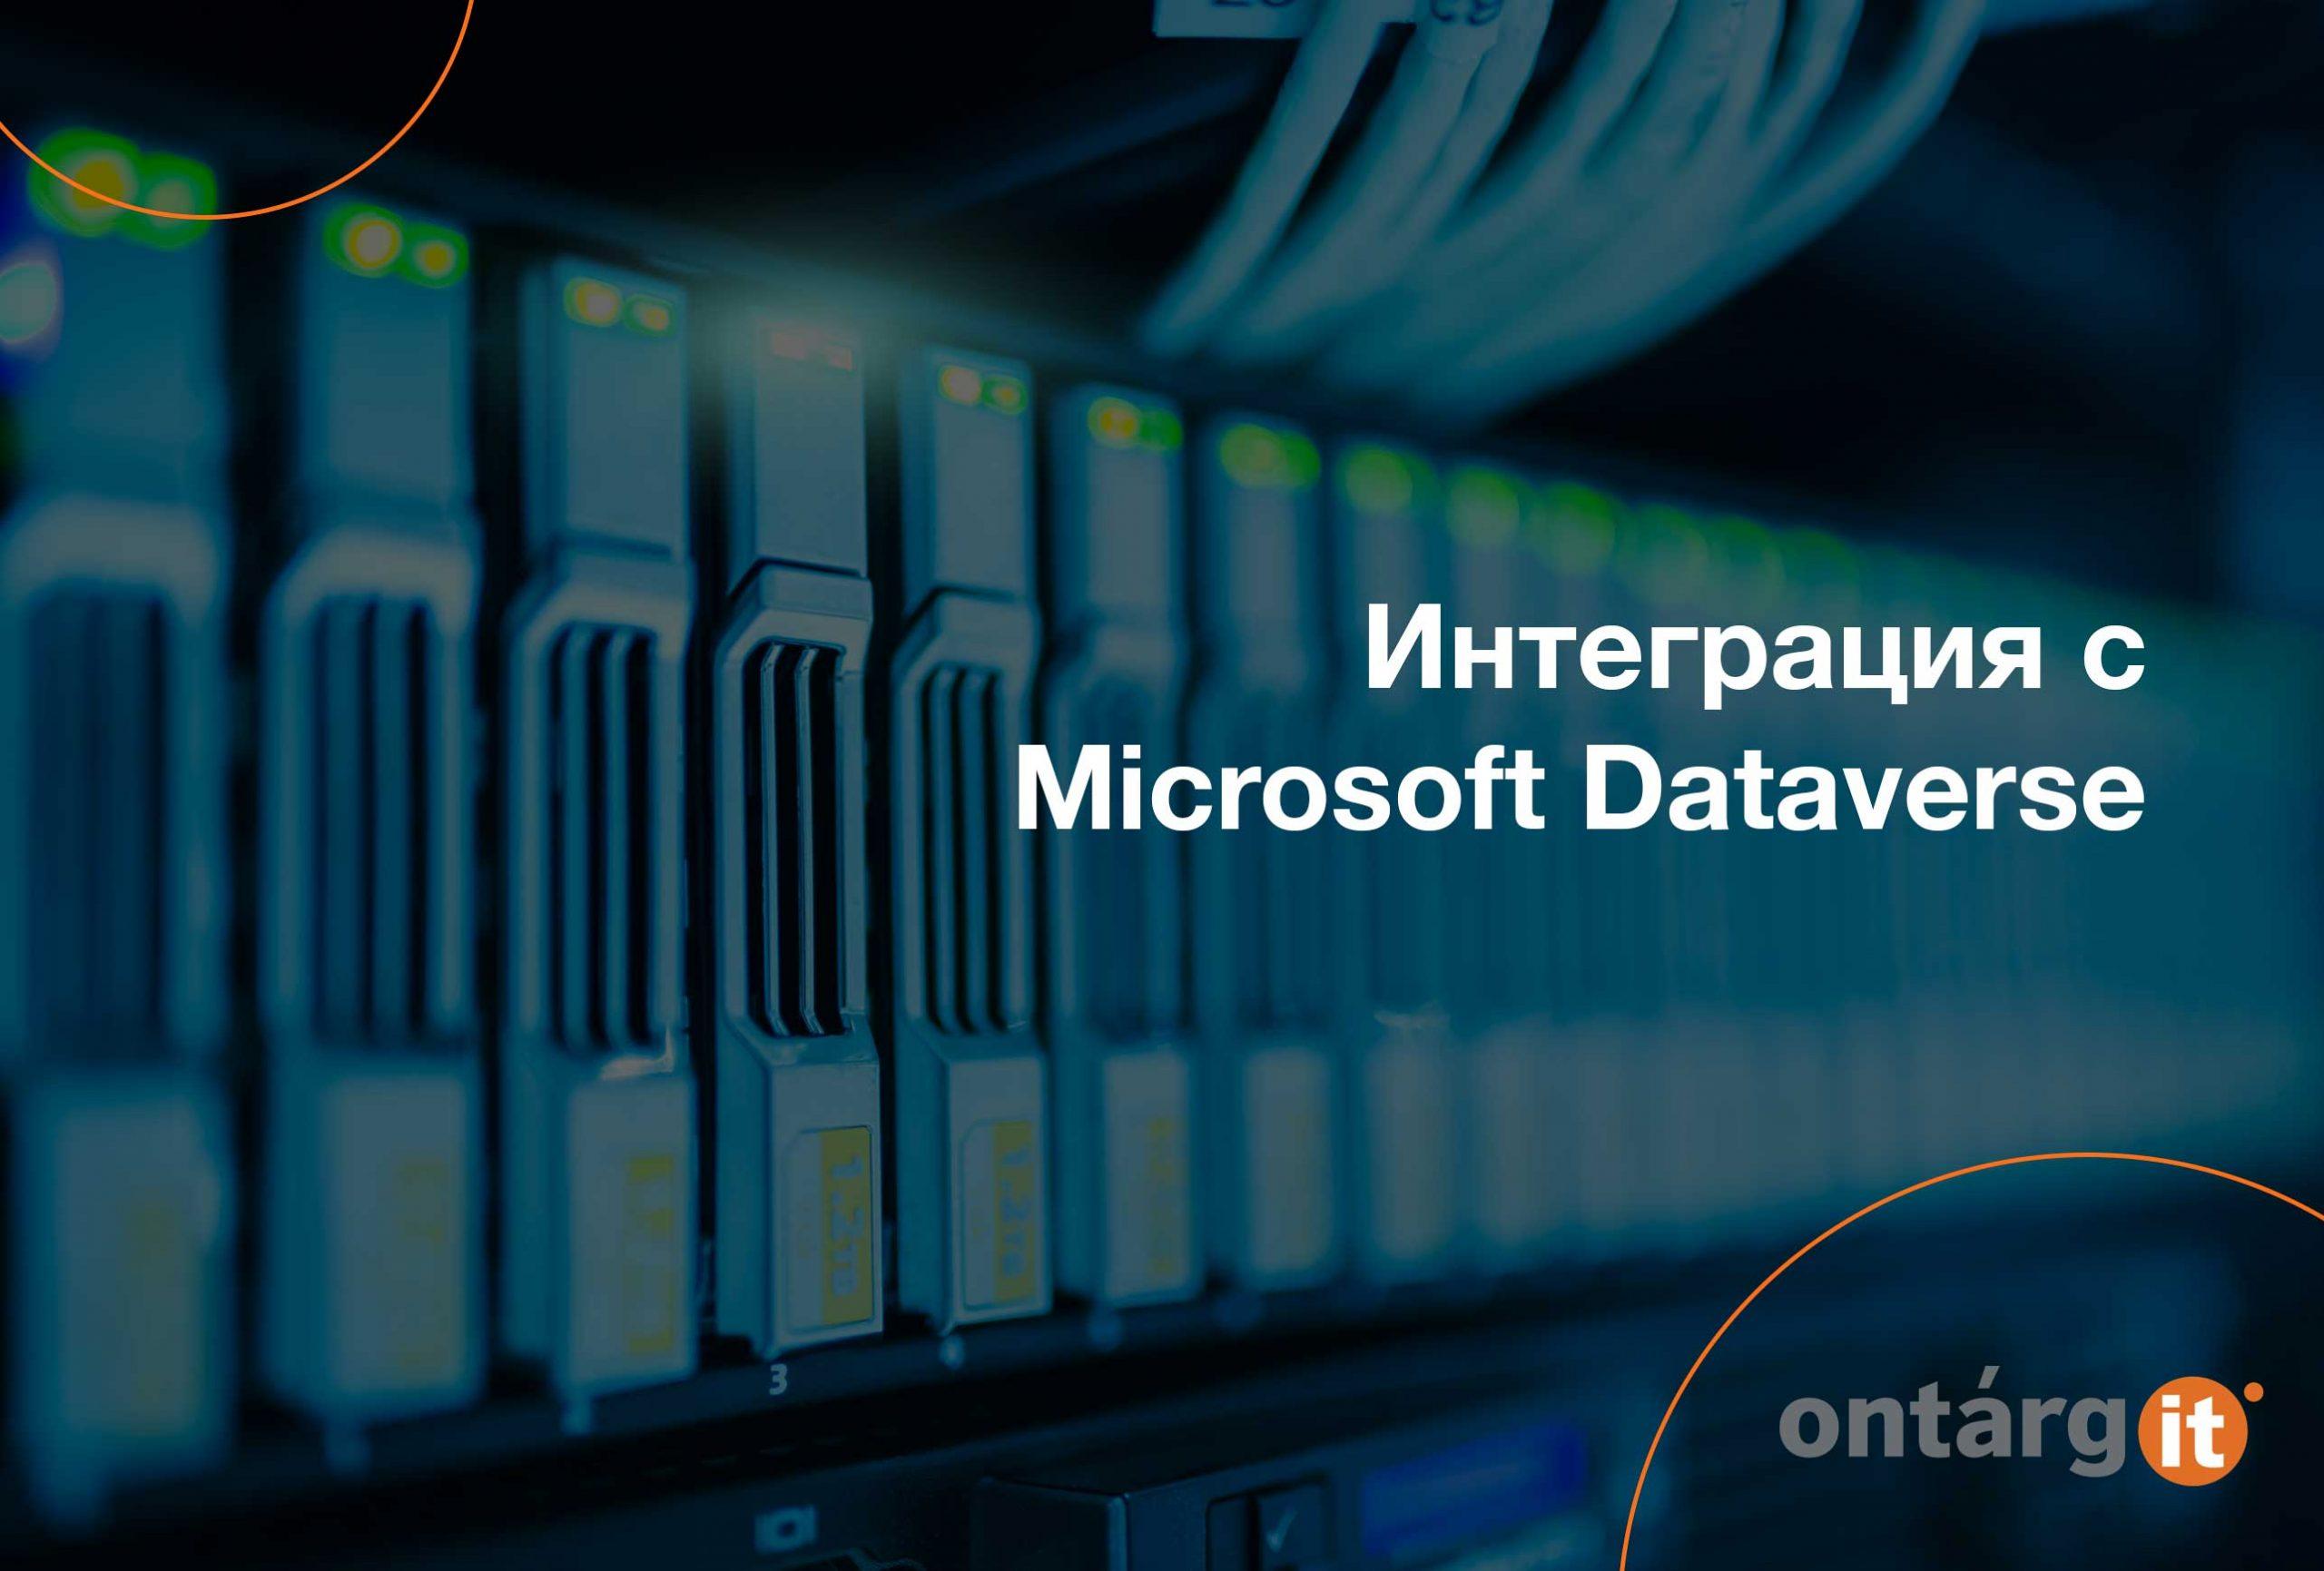 Интеграция-с-Microsoft-Dataverse